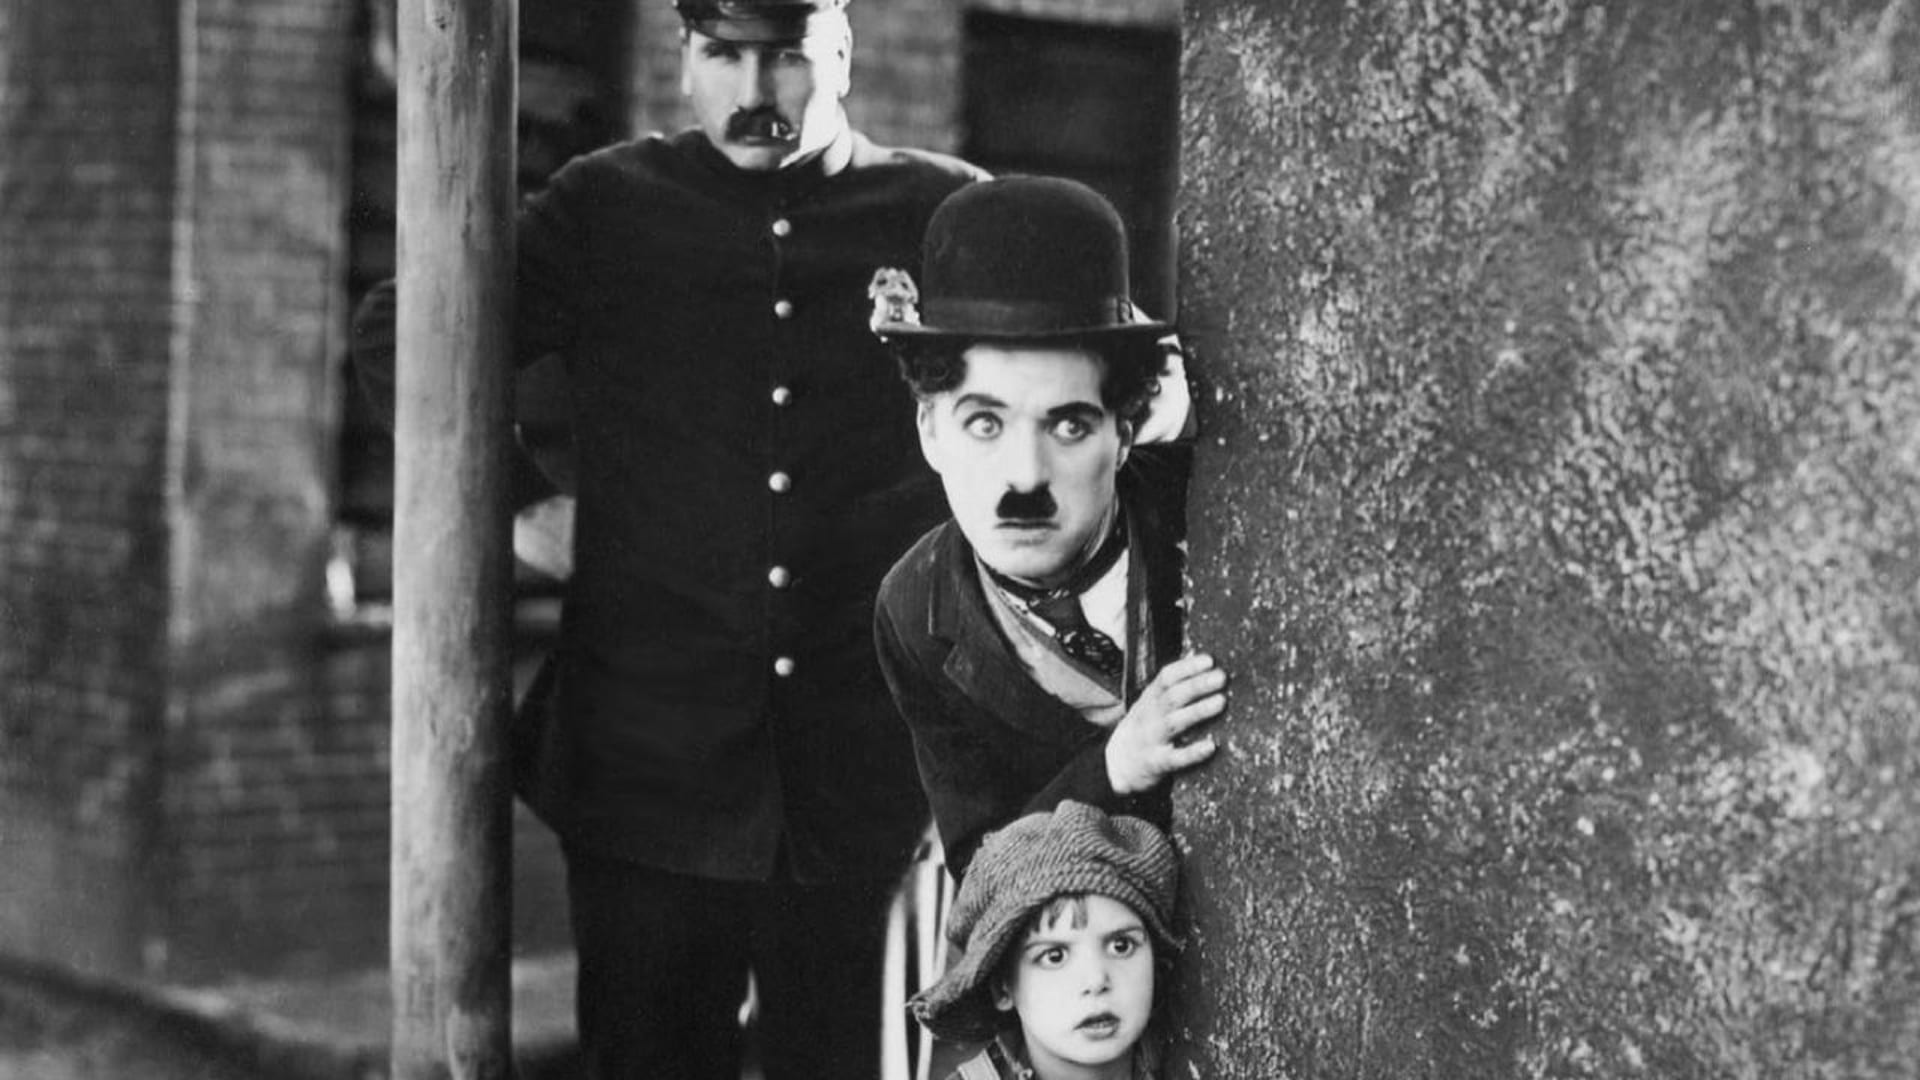 A movie trailer of Charlie Chaplin